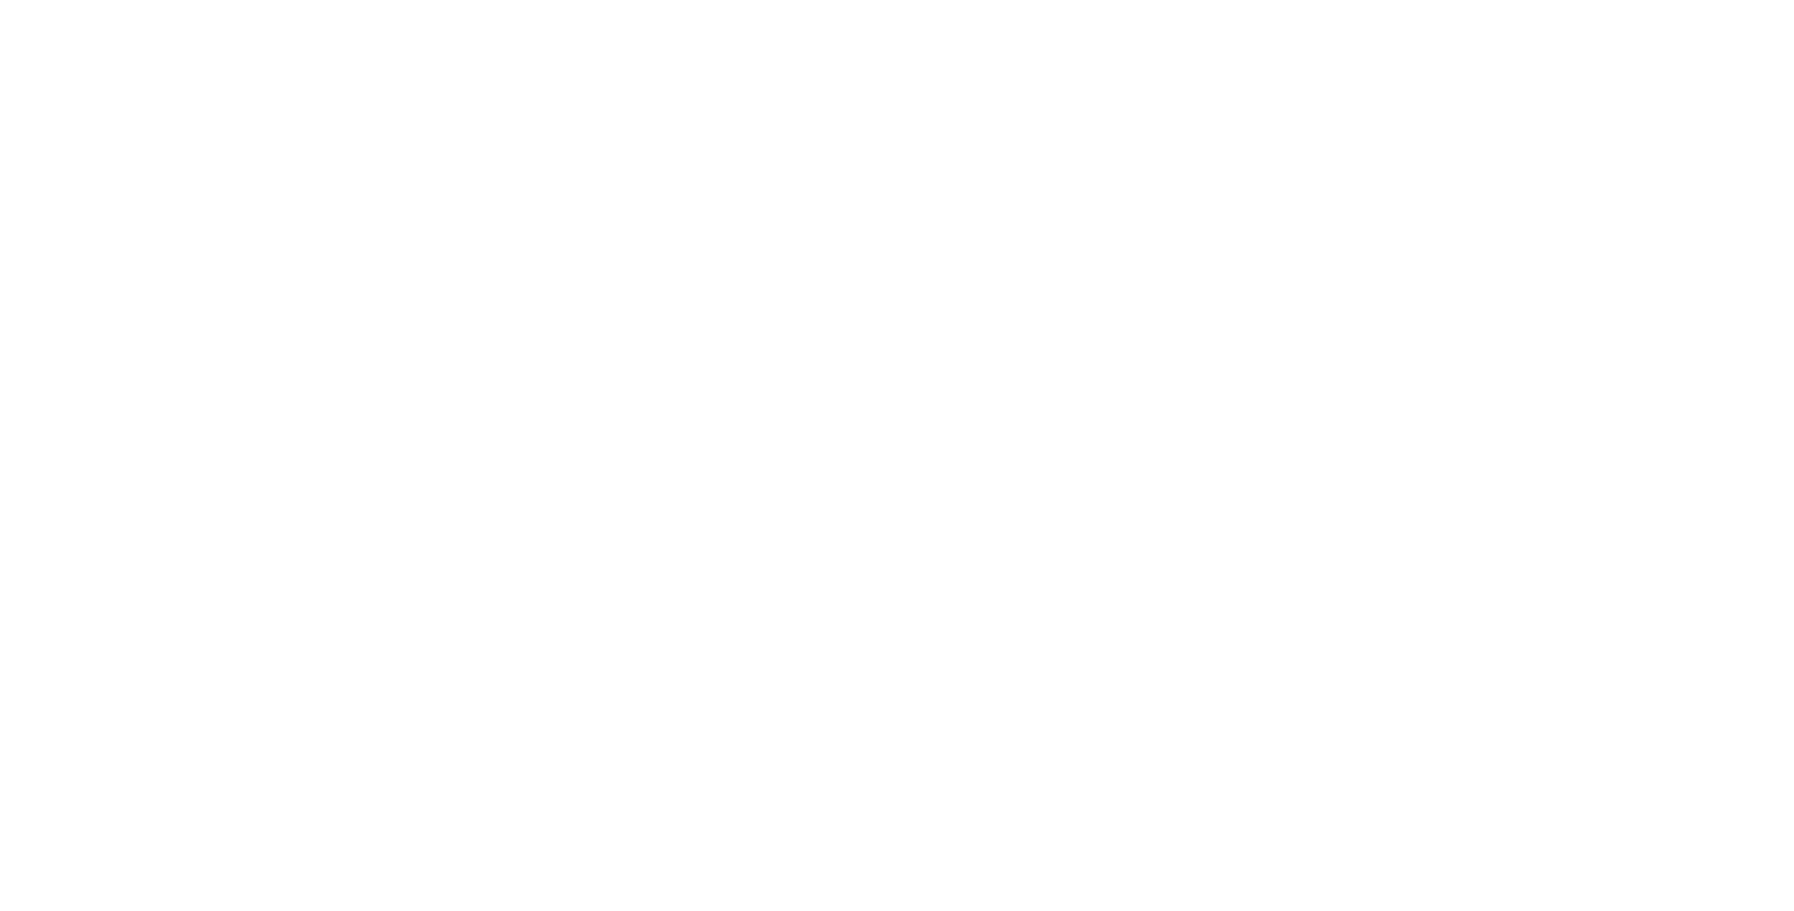 Vitale rassen logo